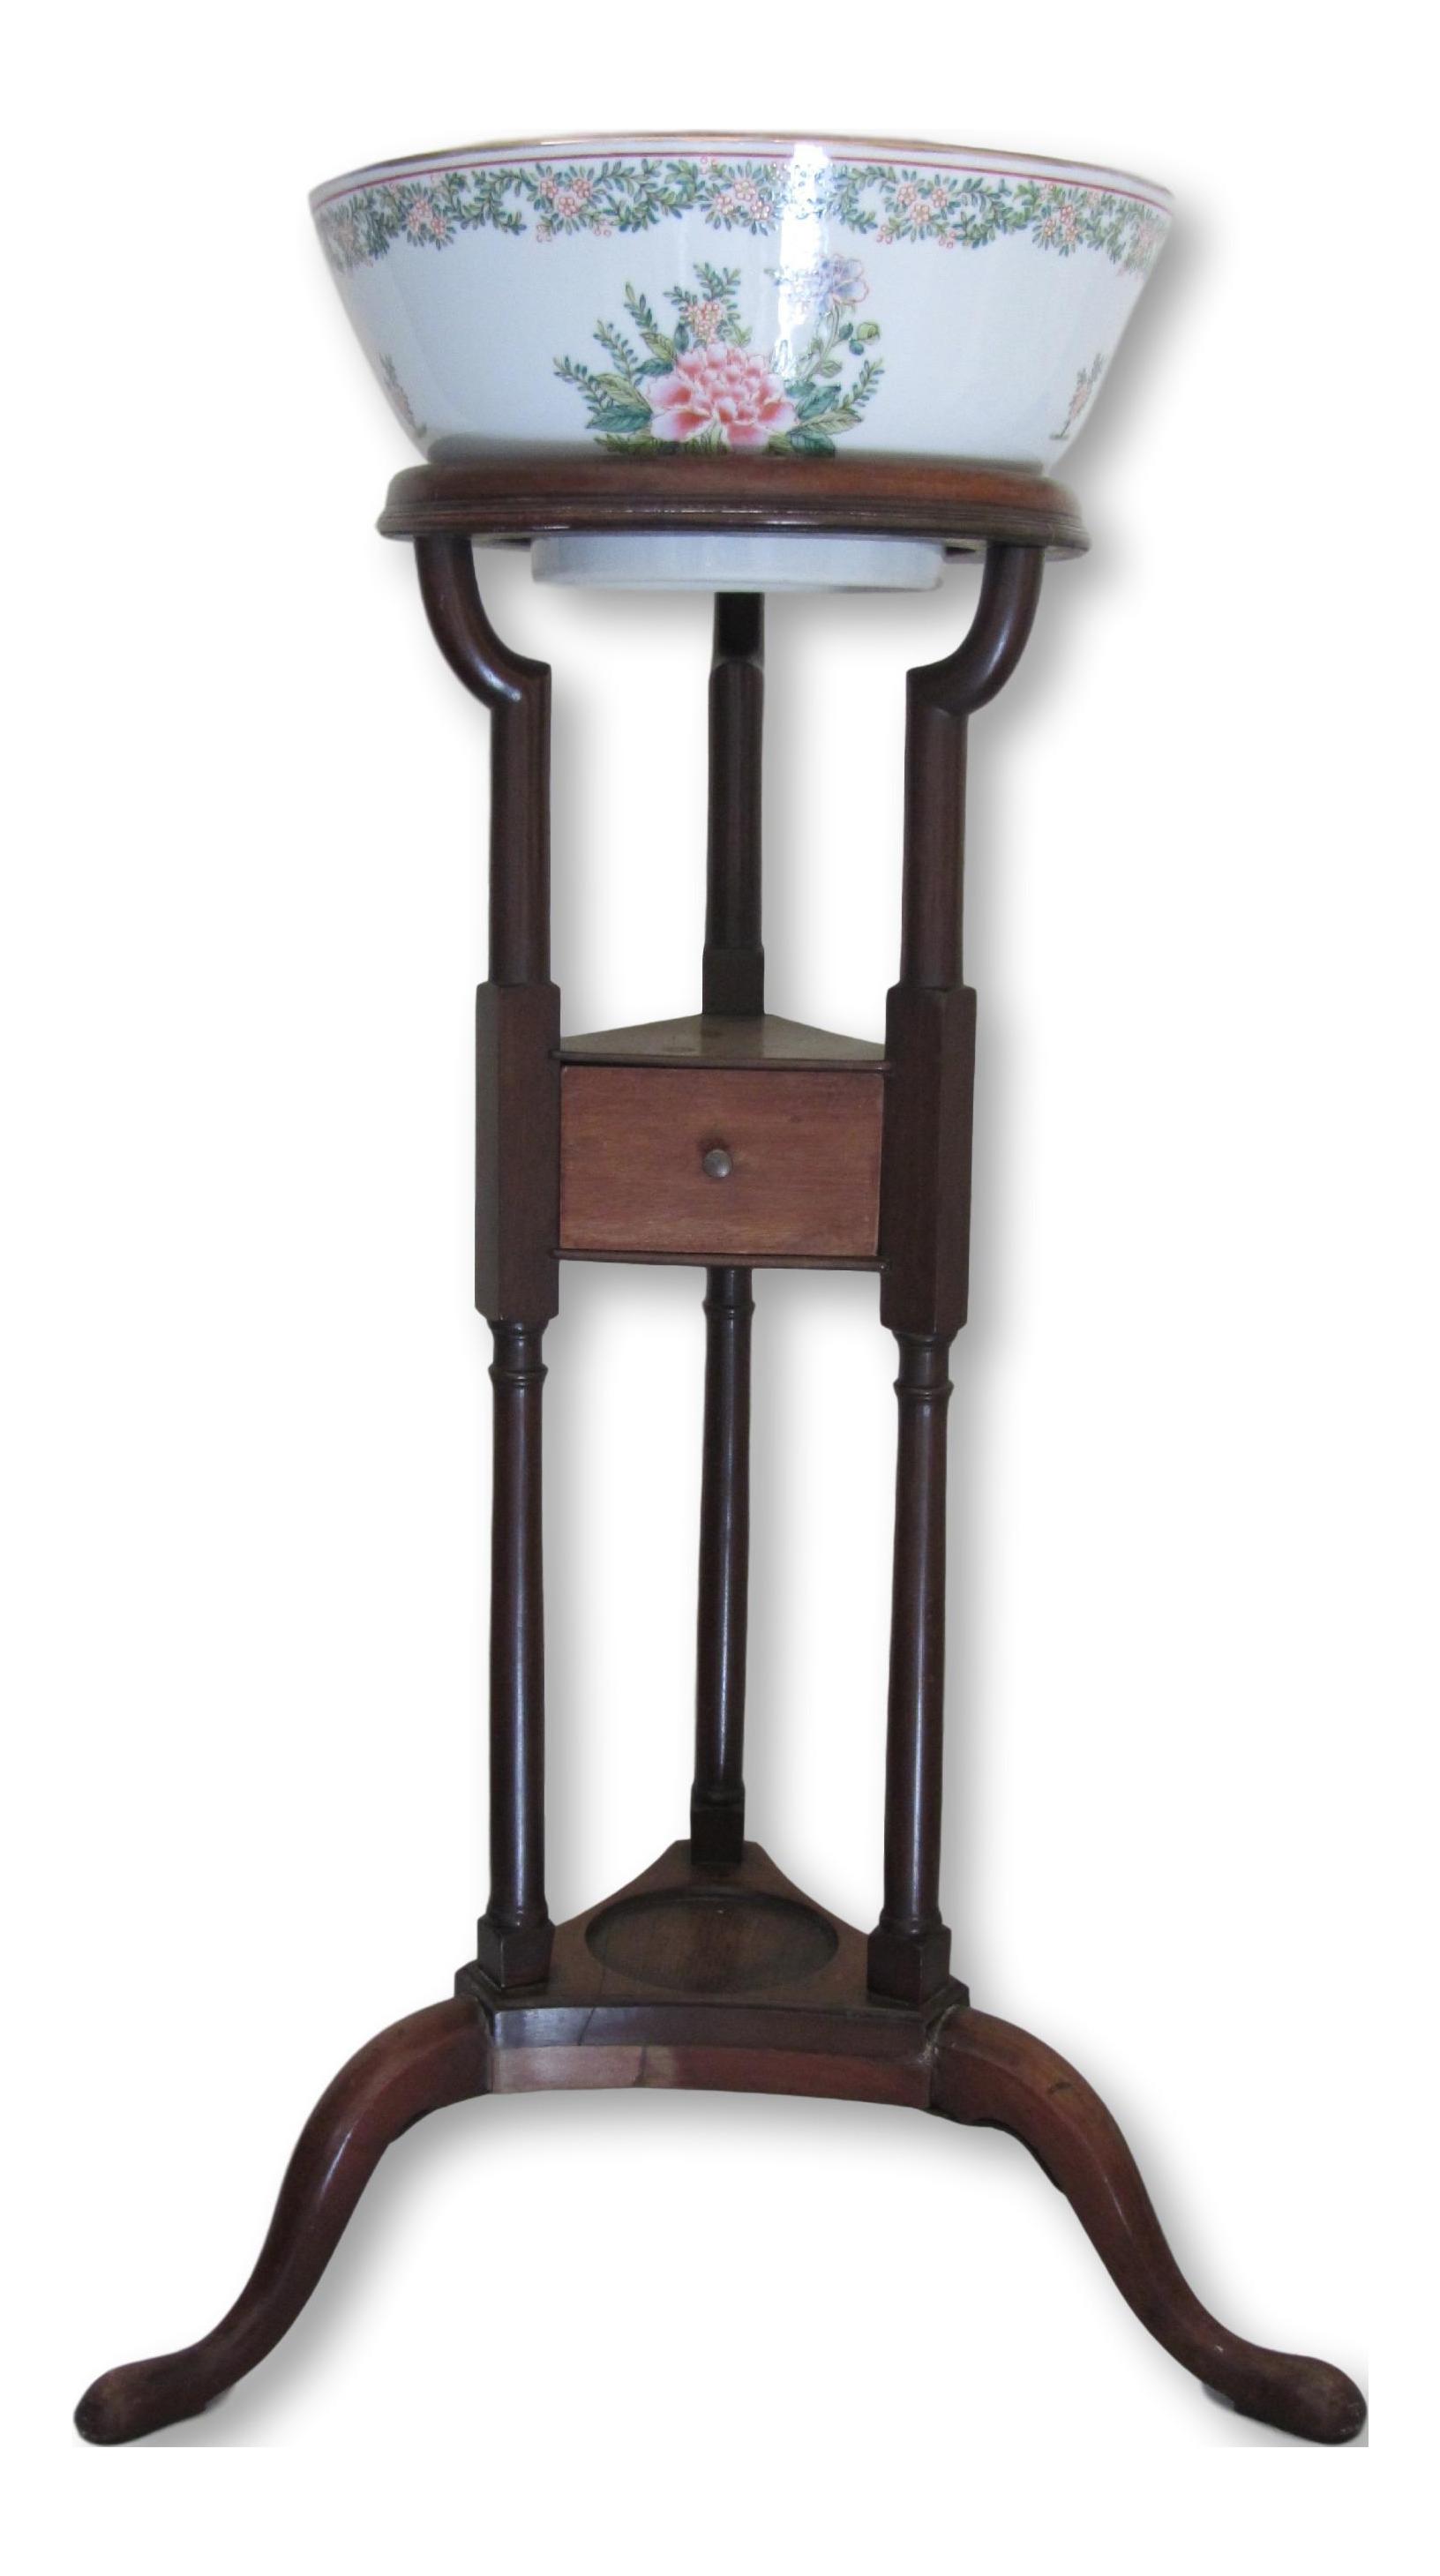 Antique Wash Basin Planter On Wooden Stand Chairish